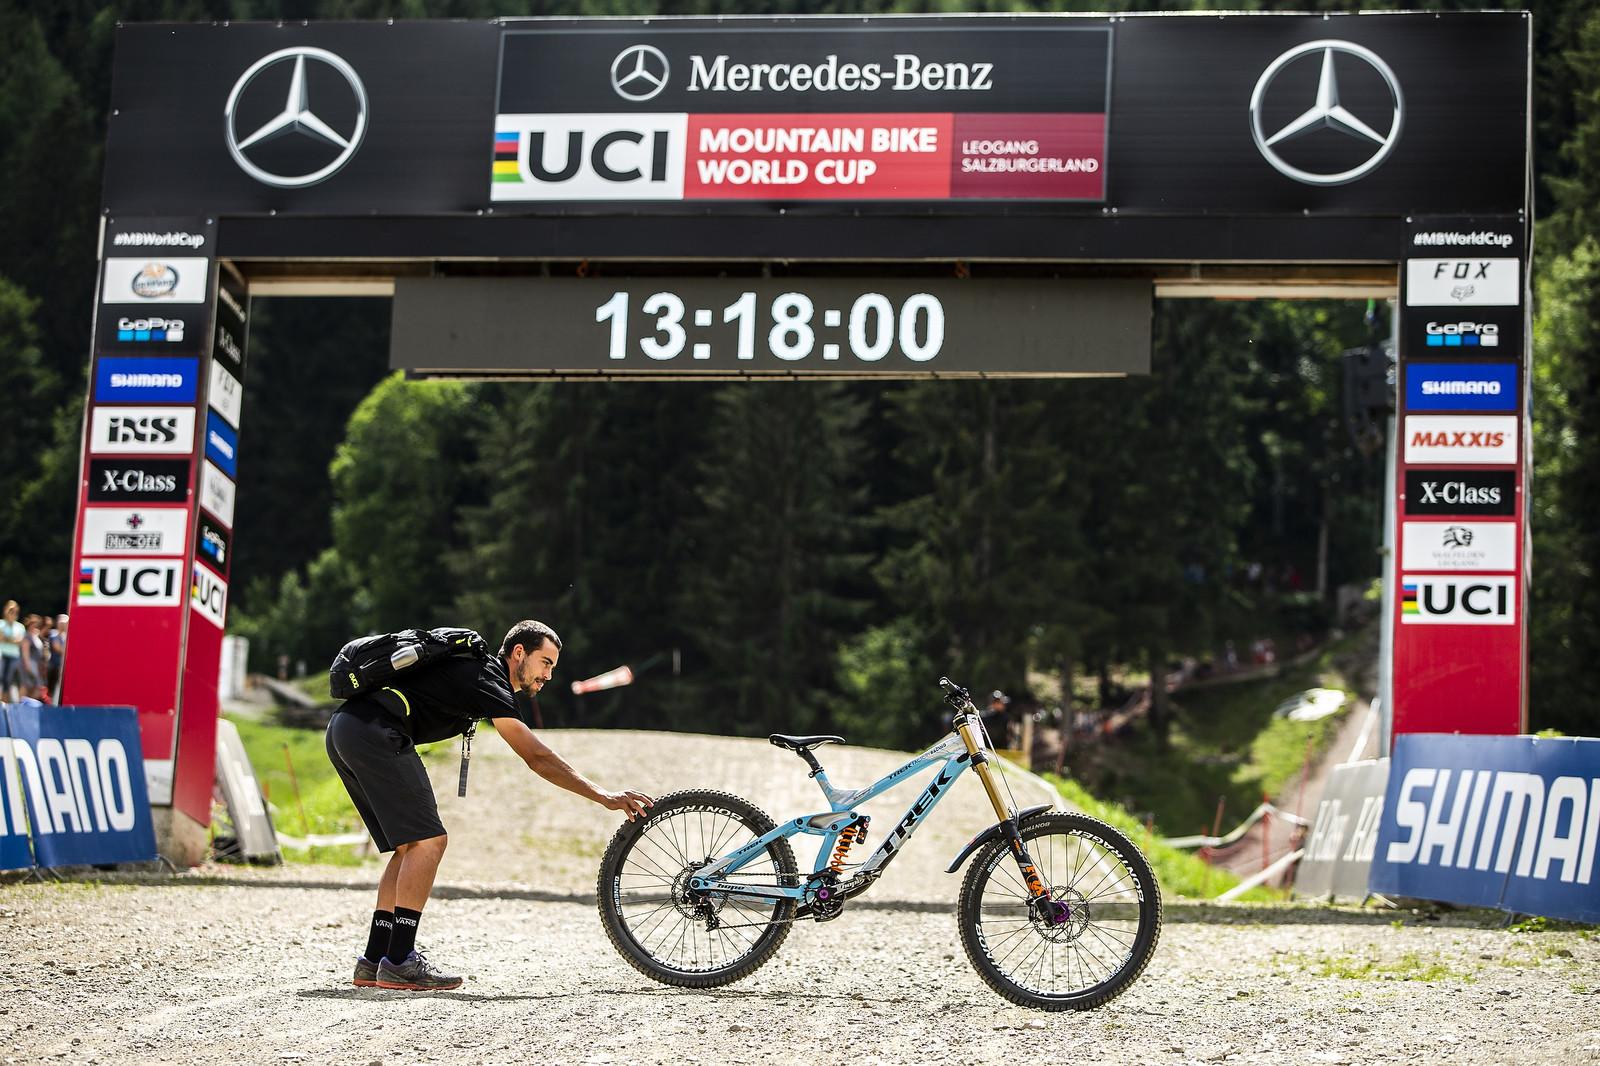 Fast Standing Still - WINNING BIKE - Rachel Atherton's Trek Session - Mountain Biking Pictures - Vital MTB